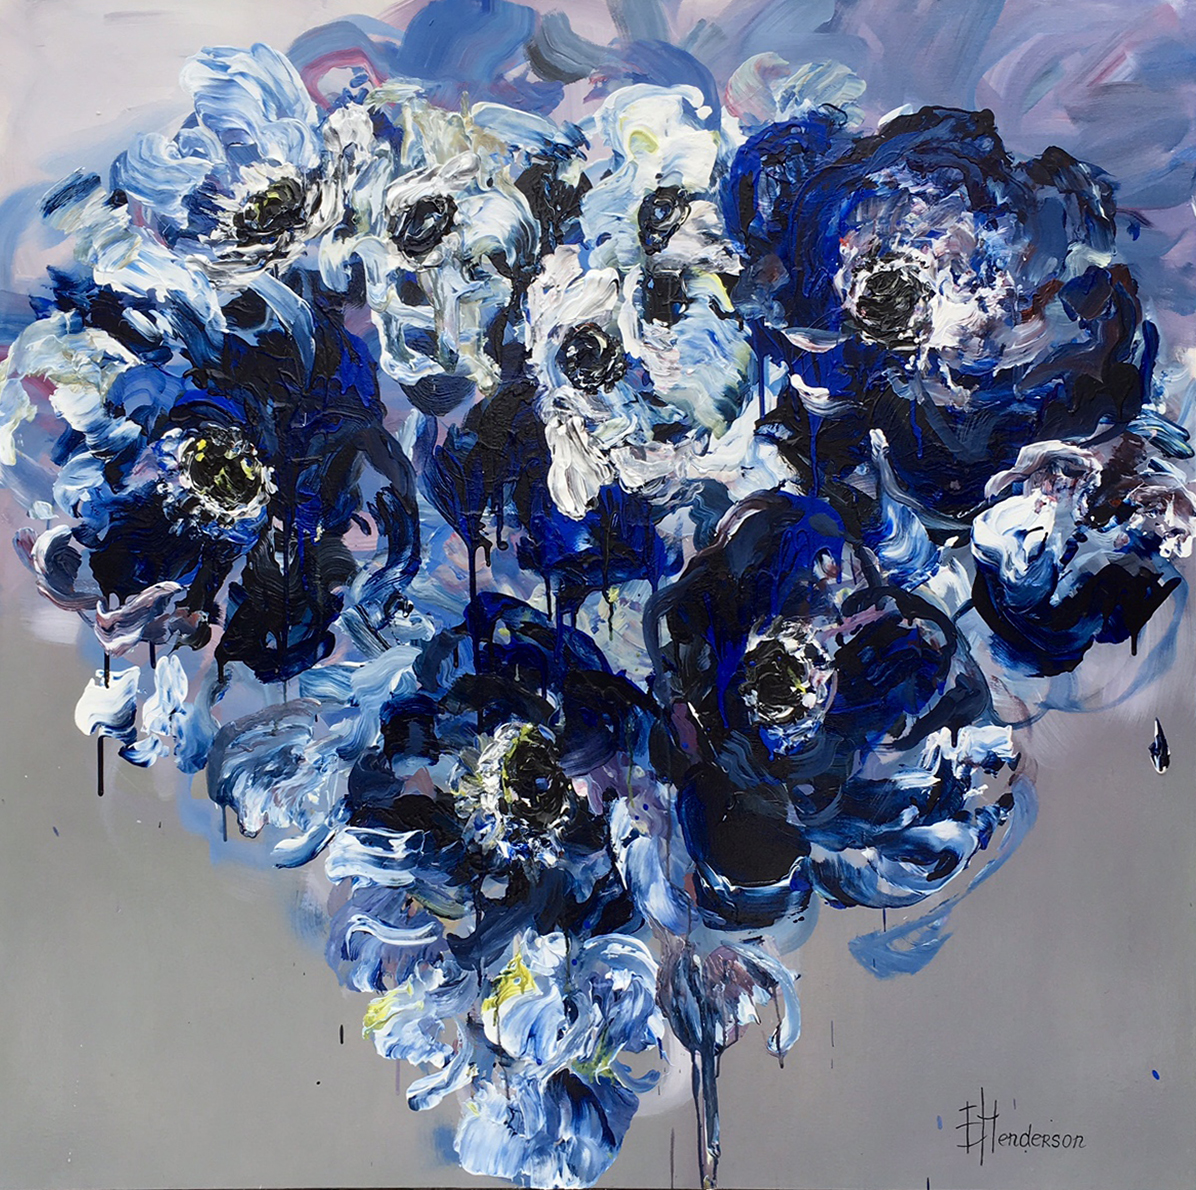 Colour Me Blue #1 by Elena Henderson